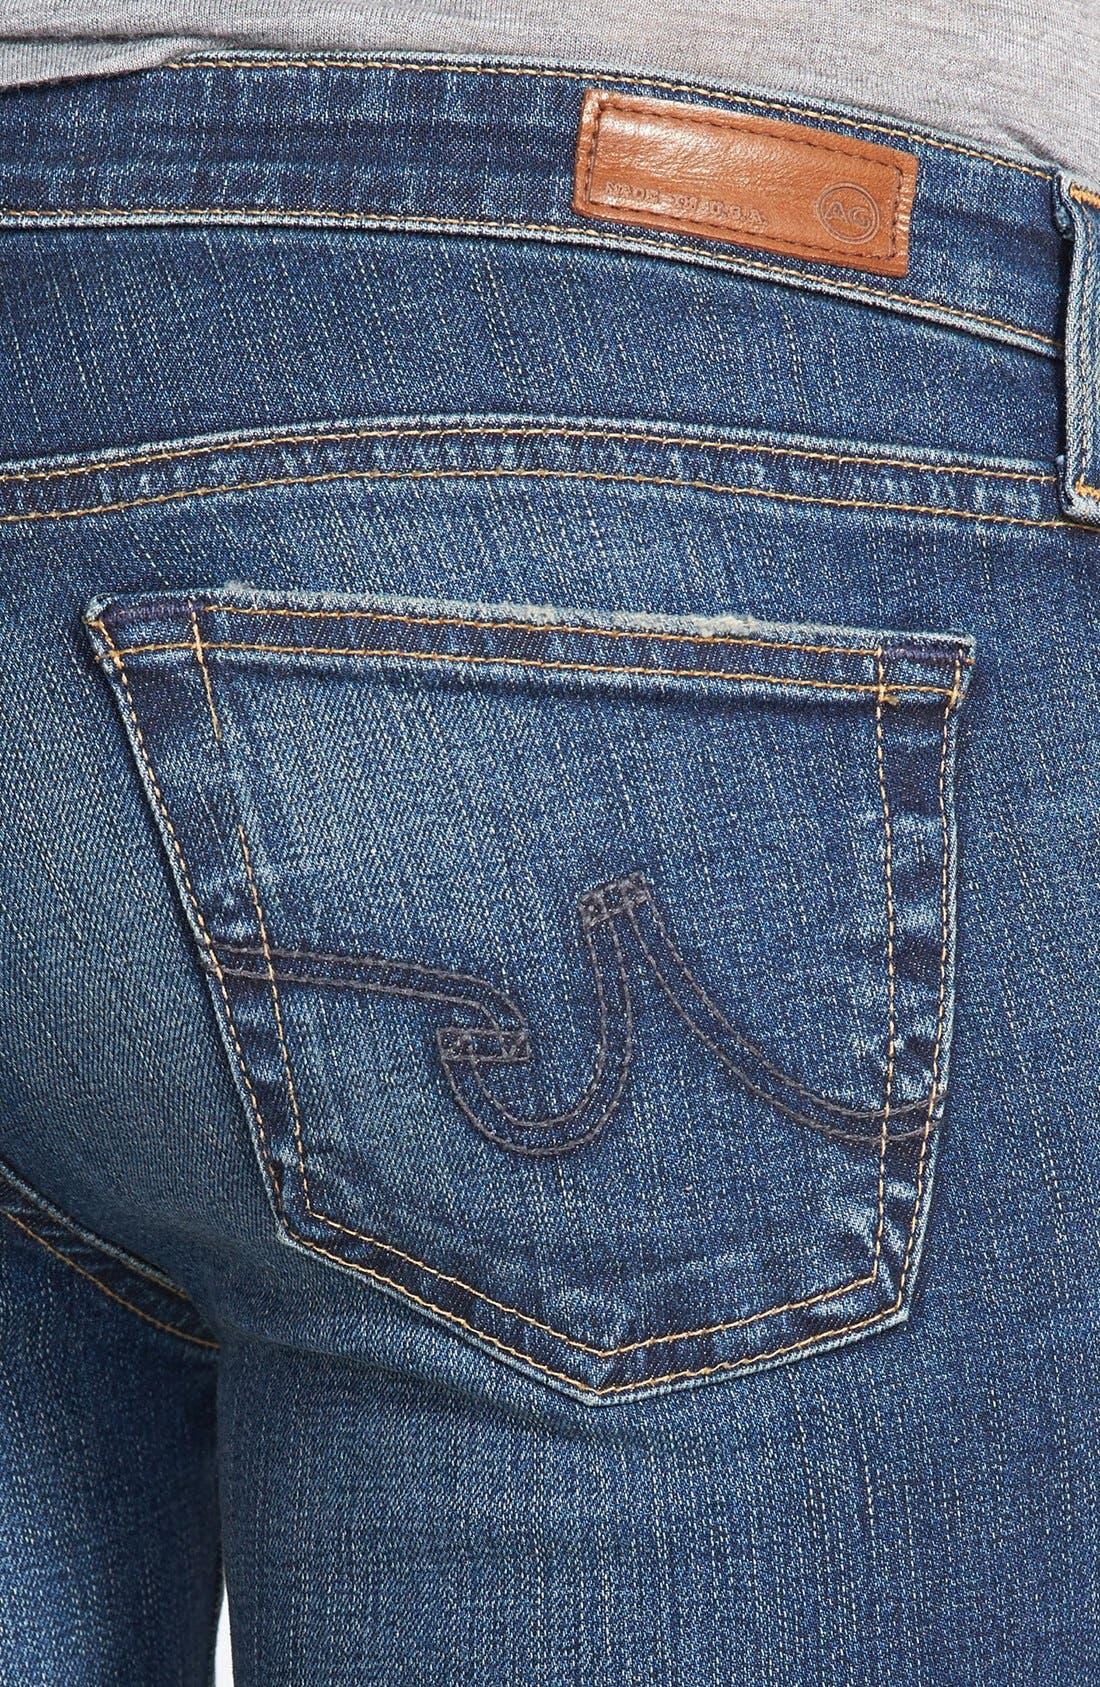 Alternate Image 3  - AG 'The Legging' Super Skinny Jeans (60-Year Dive)